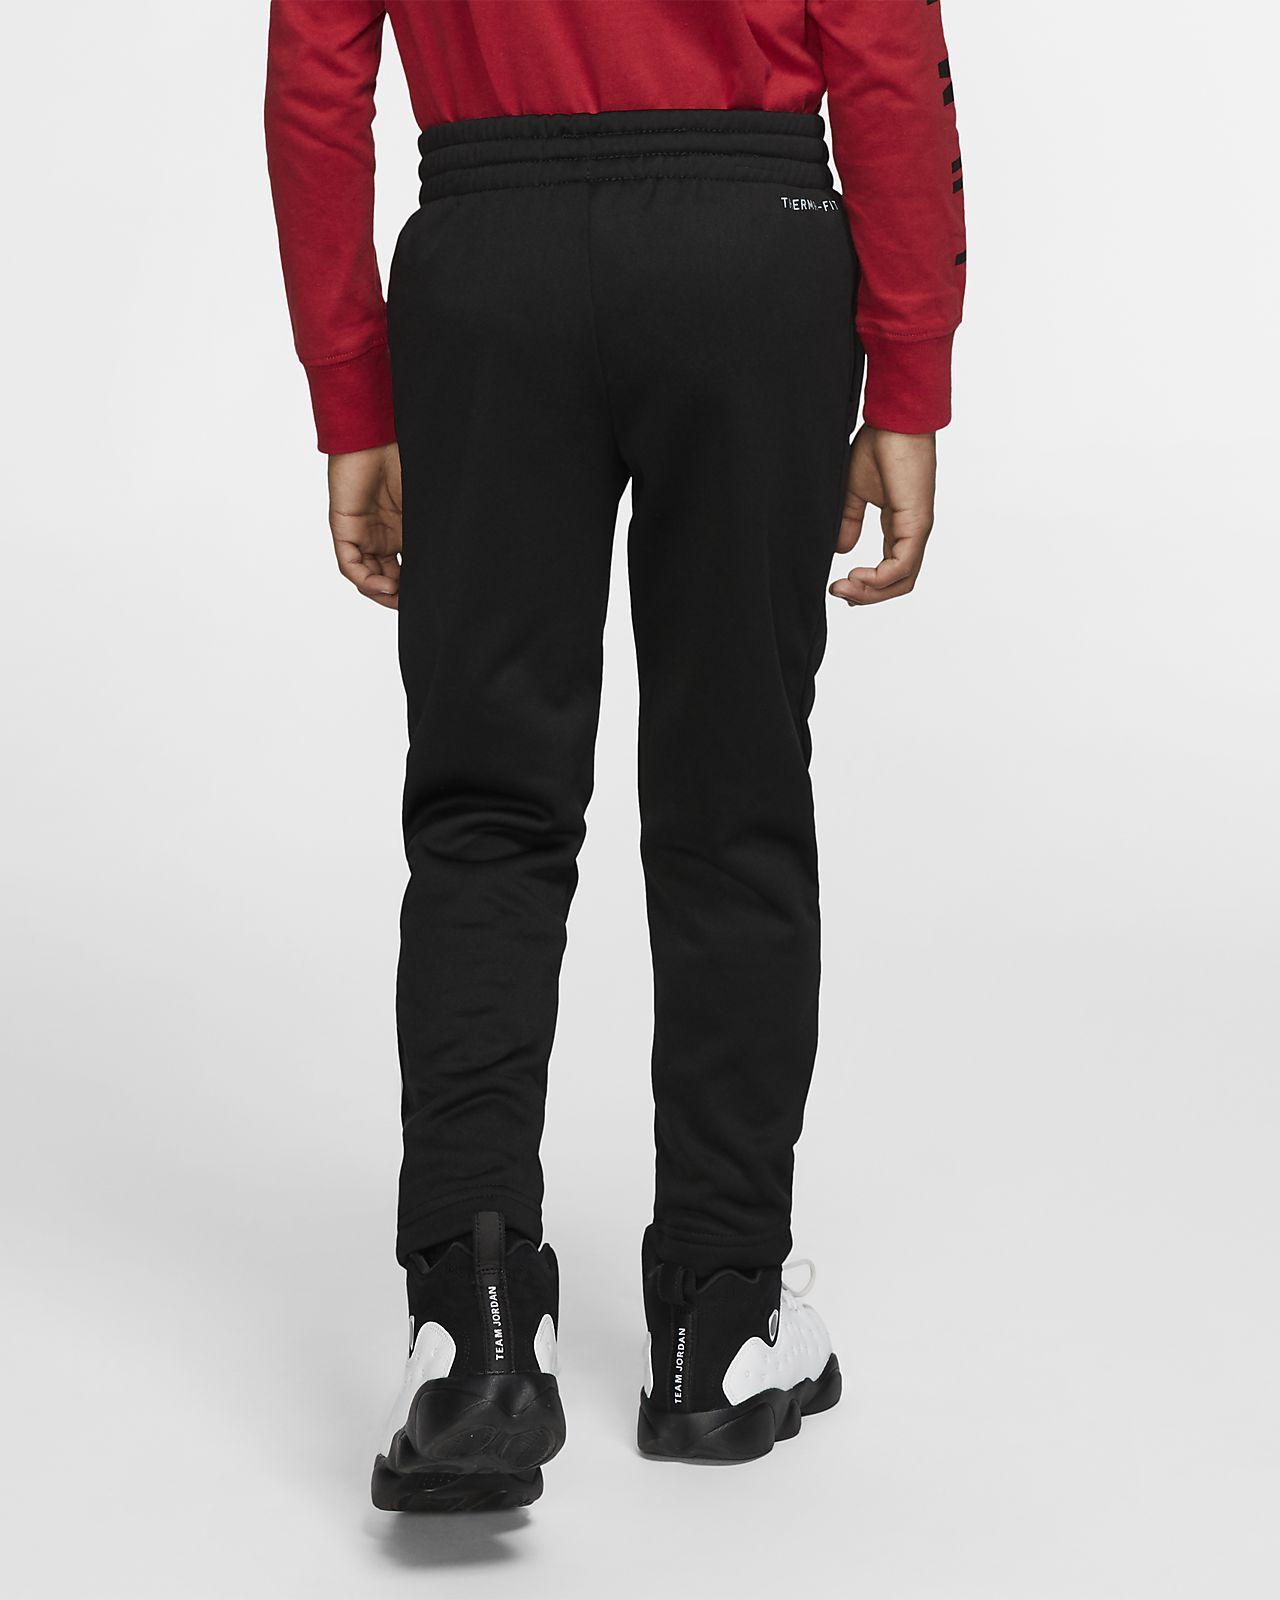 6c38478b9311d6 Jordan 23 Alpha Therma Little Kids  (Boys ) Pants. Nike.com